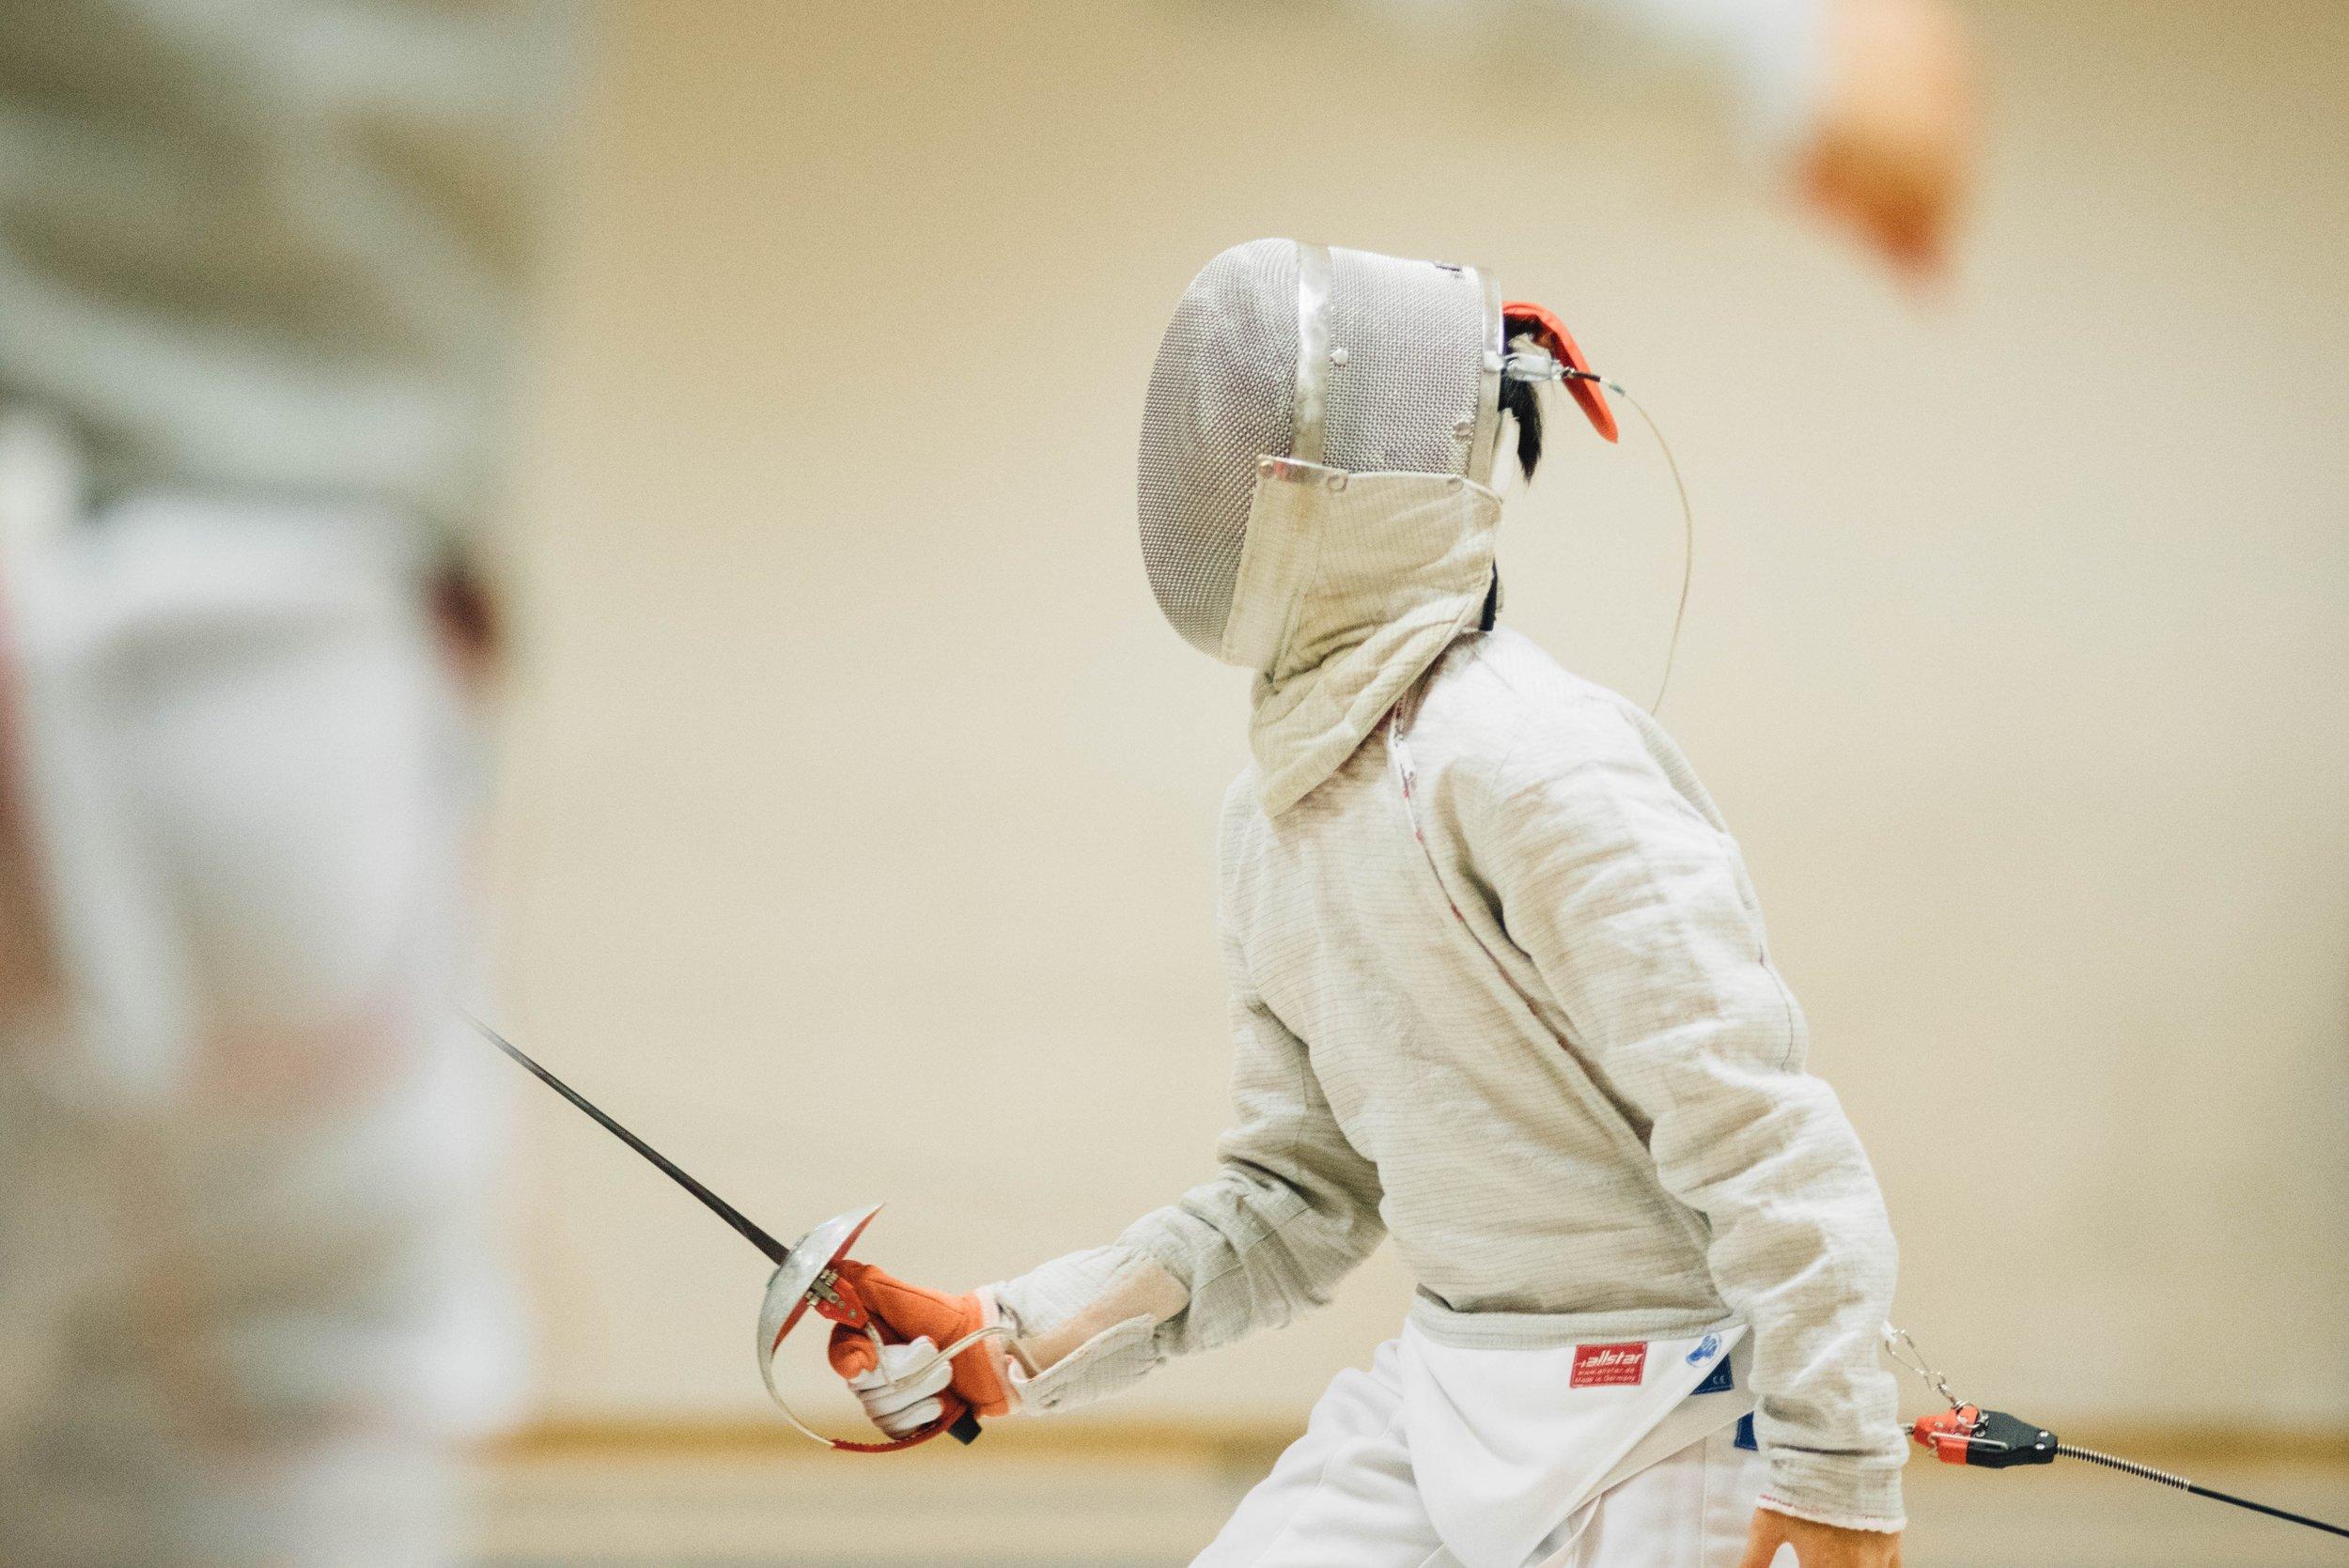 fencing in pentathalon uk